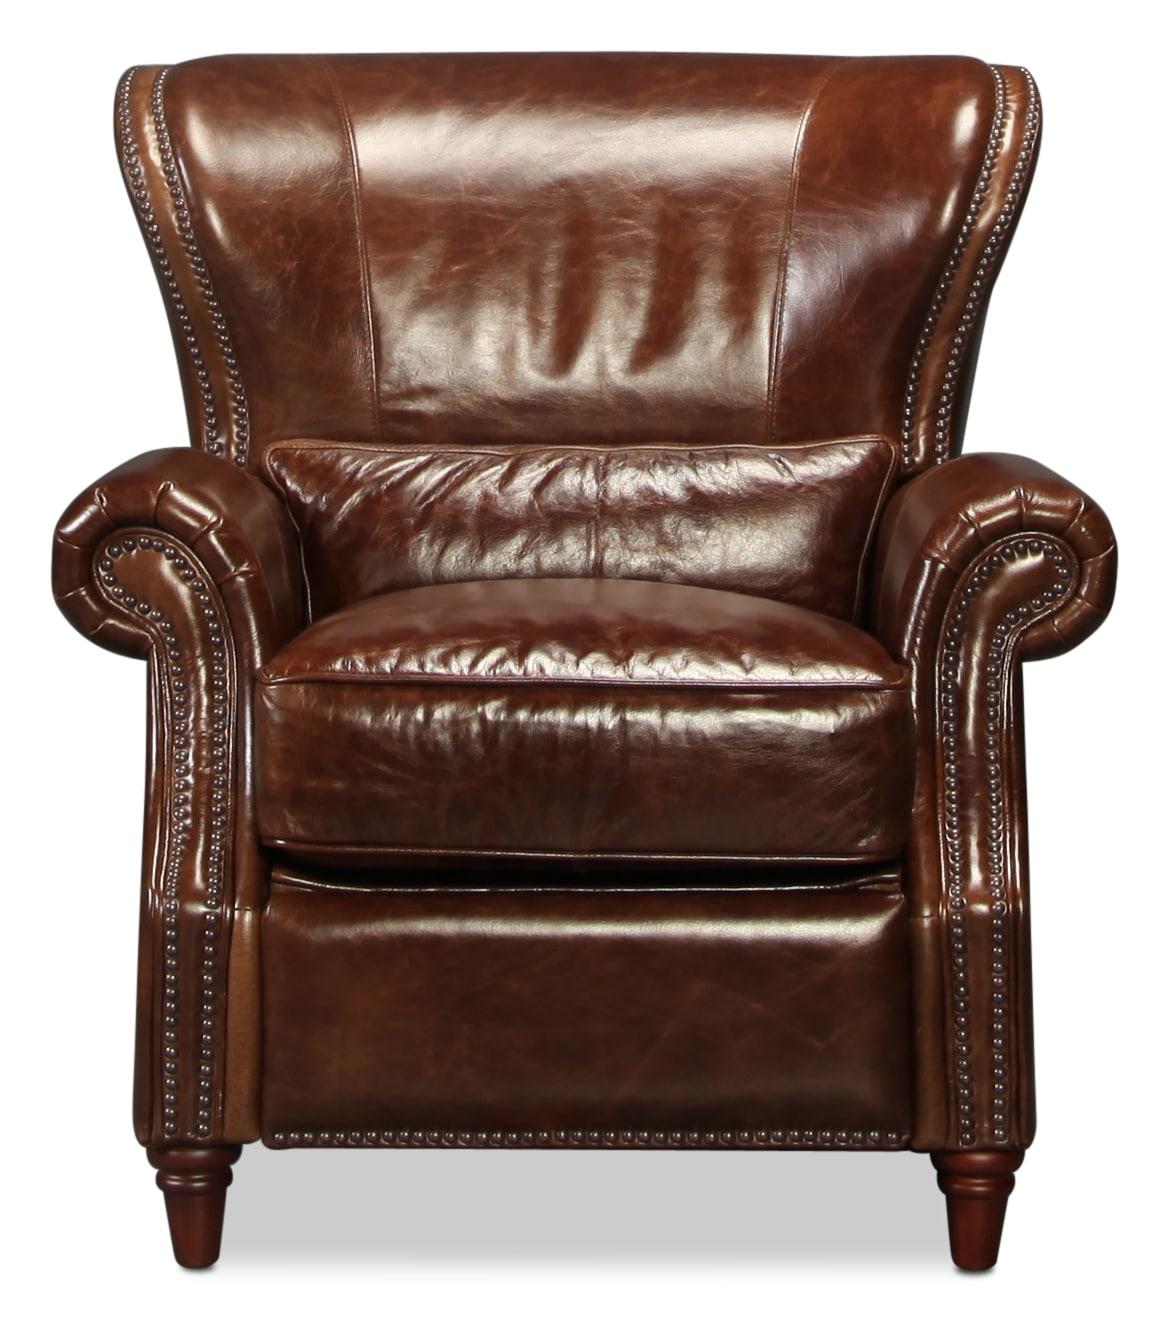 Natalia Leather Chair - Cigar